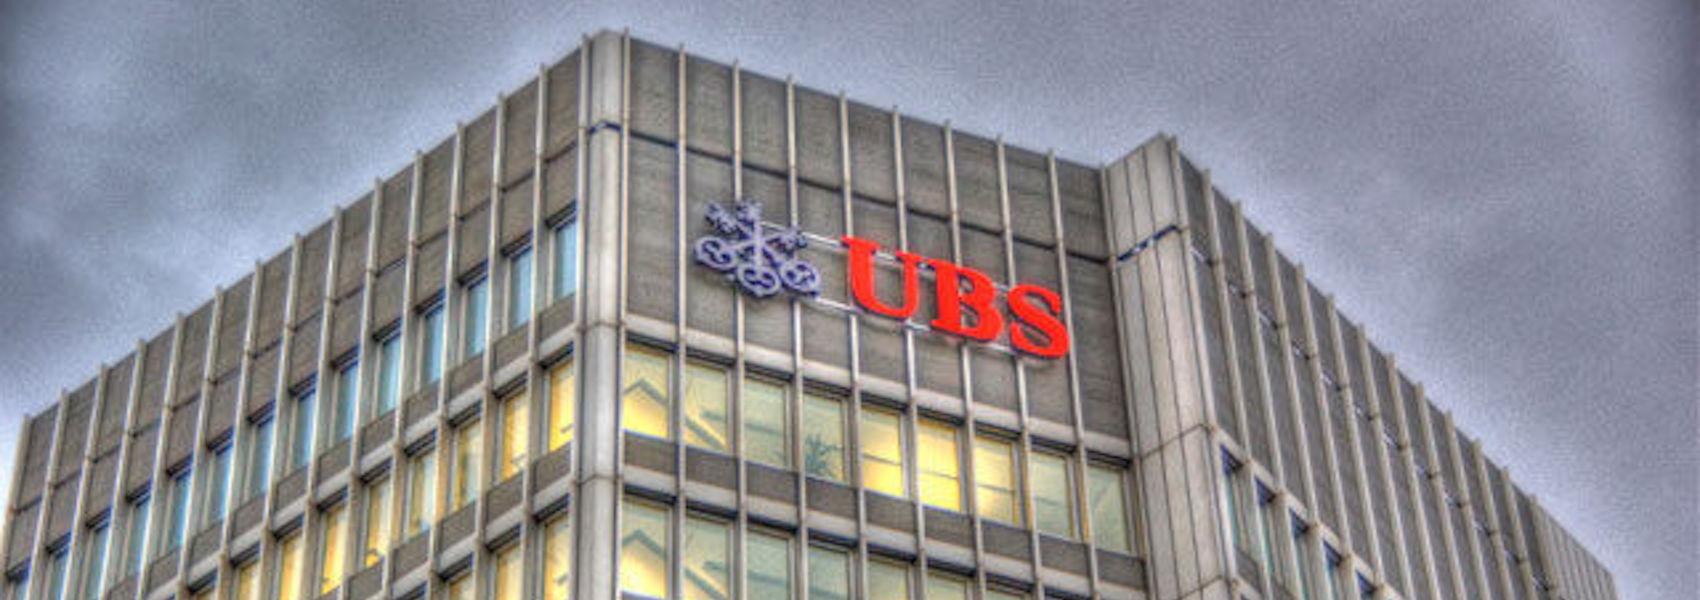 ubs_building_34874